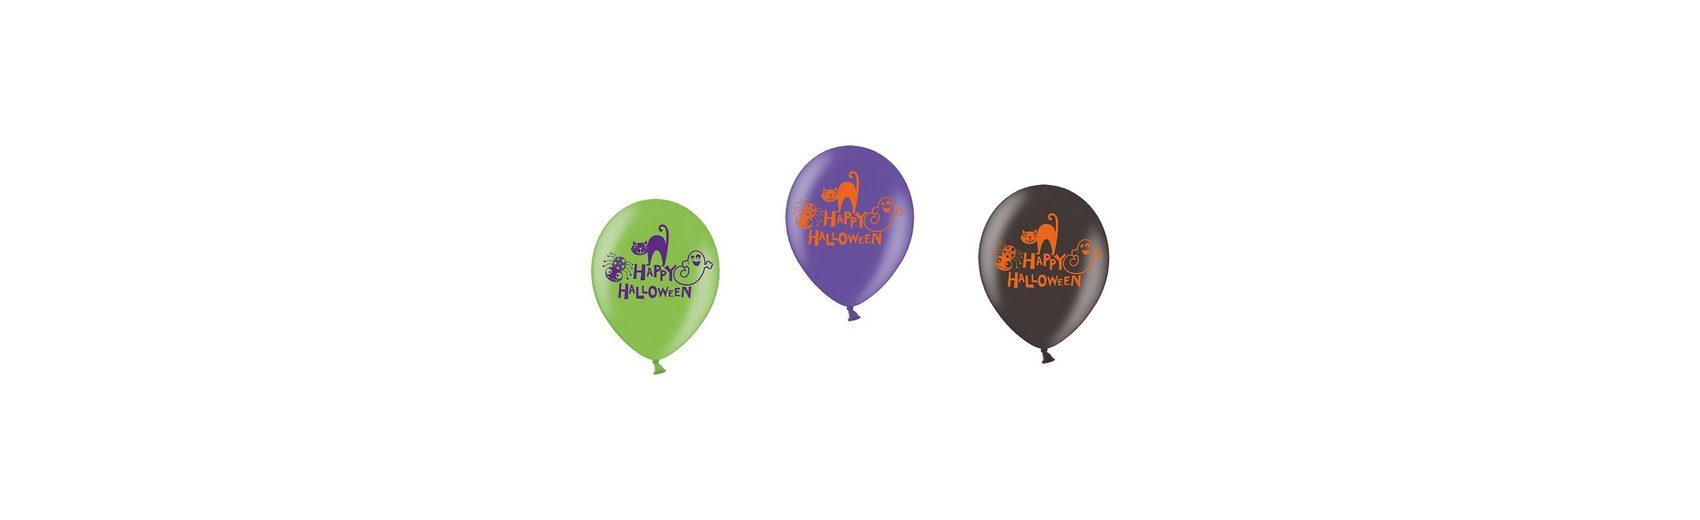 Amscan Luftballons Halloween Family Friendly, 6 Stück